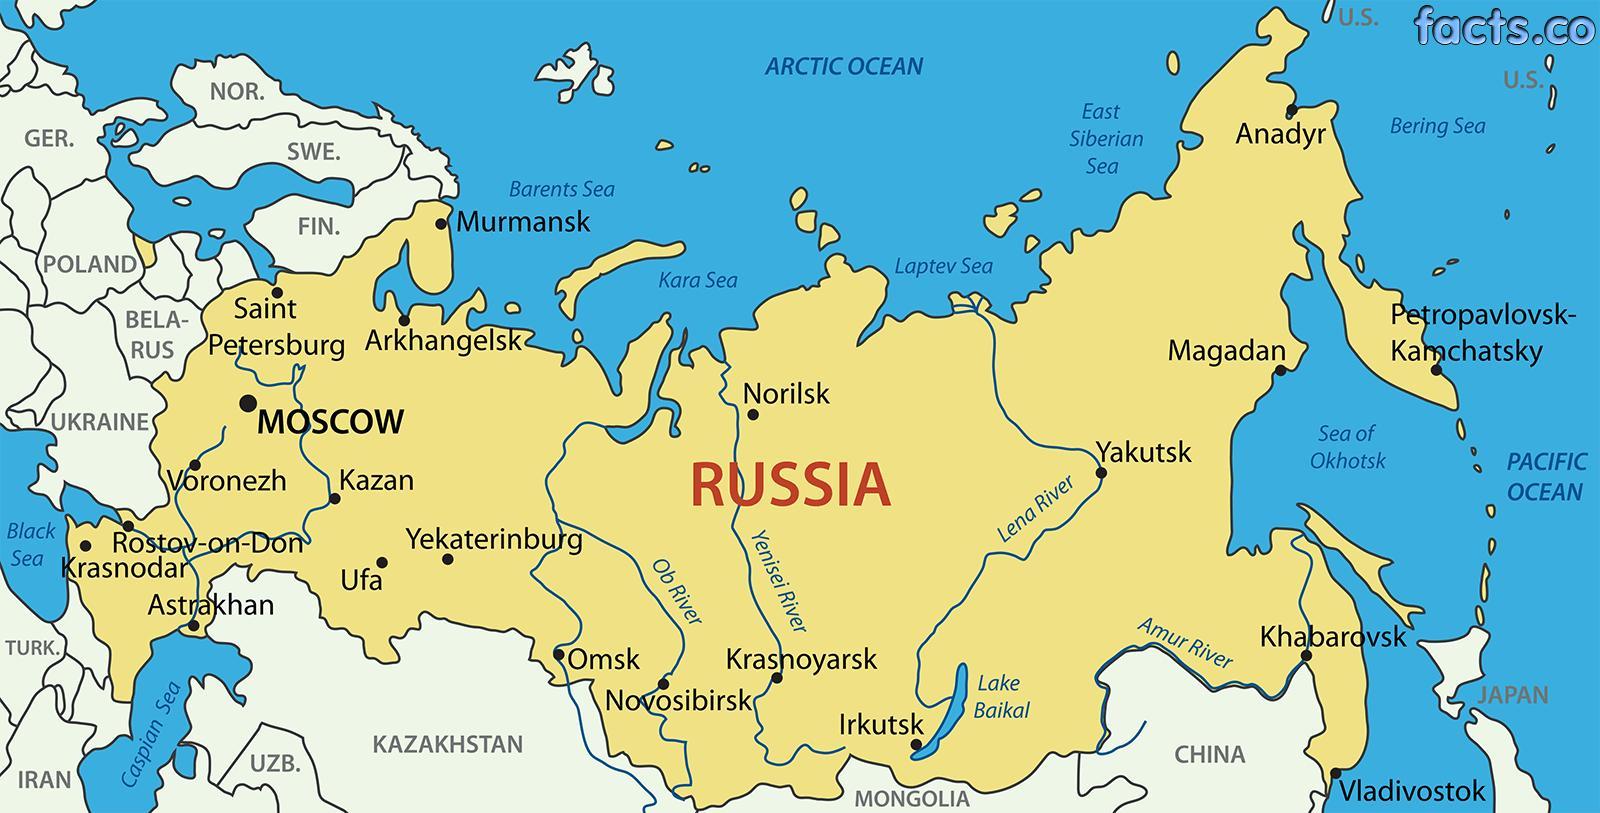 russland kart Russland kart merket   Merket kart over Russland (Øst Europa   Europa) russland kart